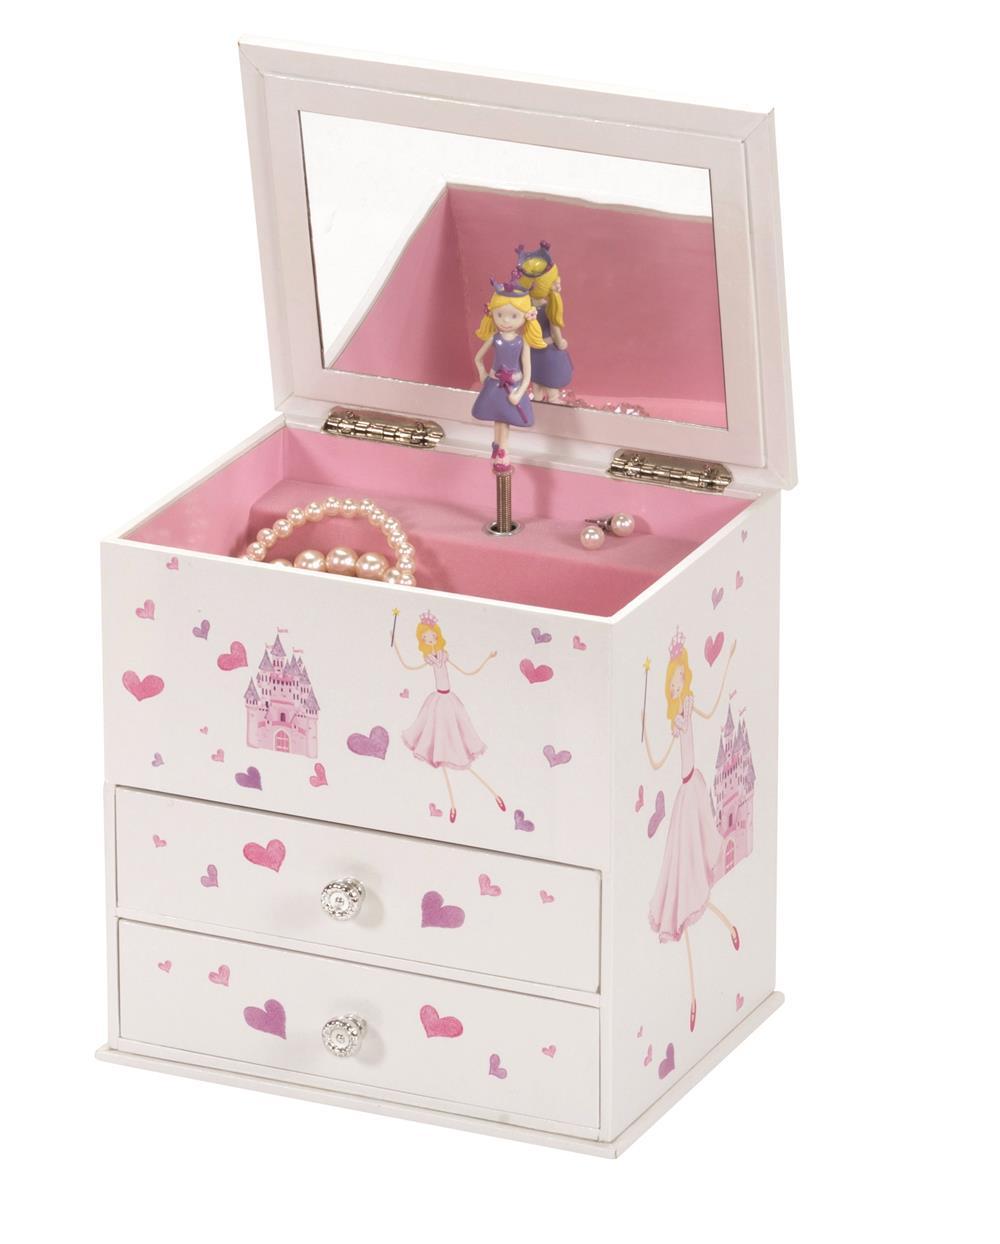 Beatrice princess and castle musical jewel box